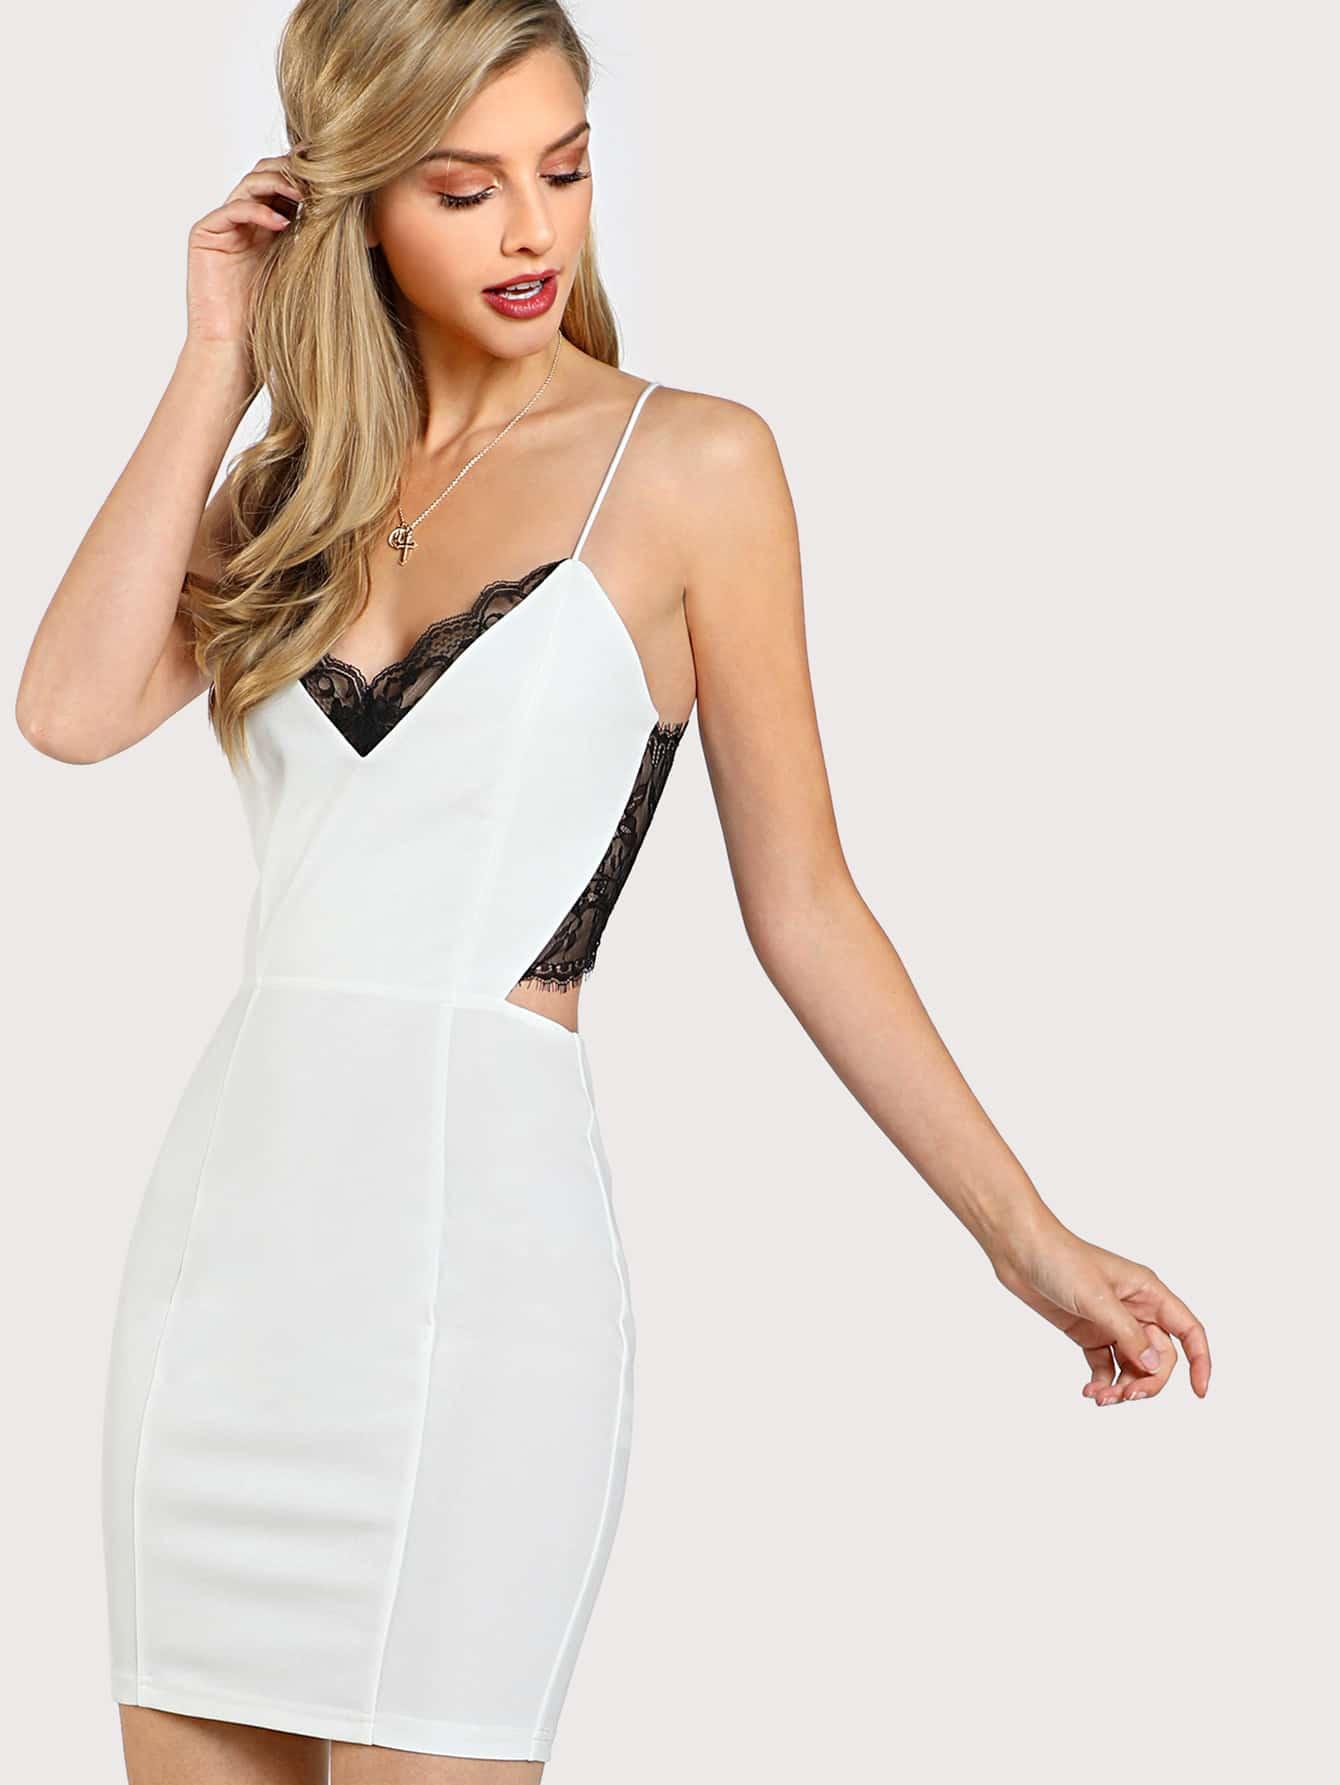 Lace Panel Cut Out Cami Dress dress171117707